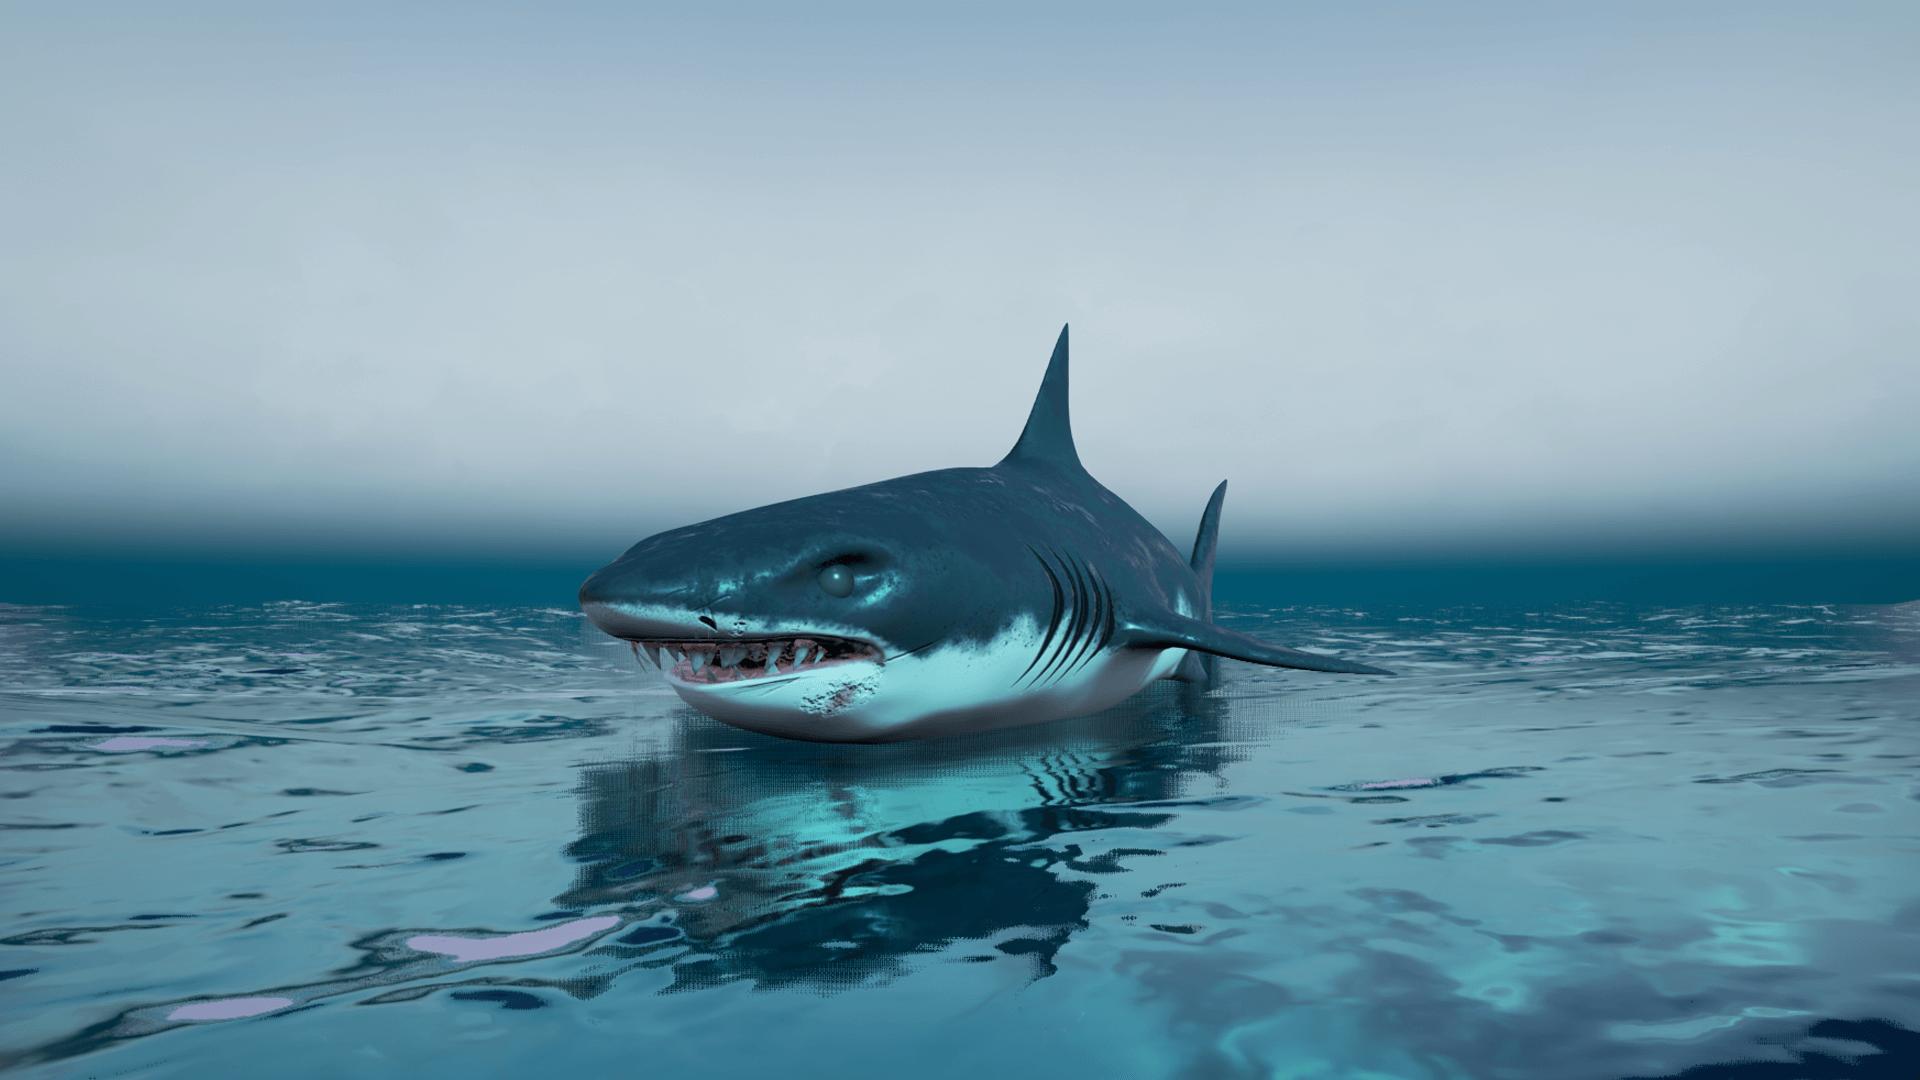 Картинки черные акулы